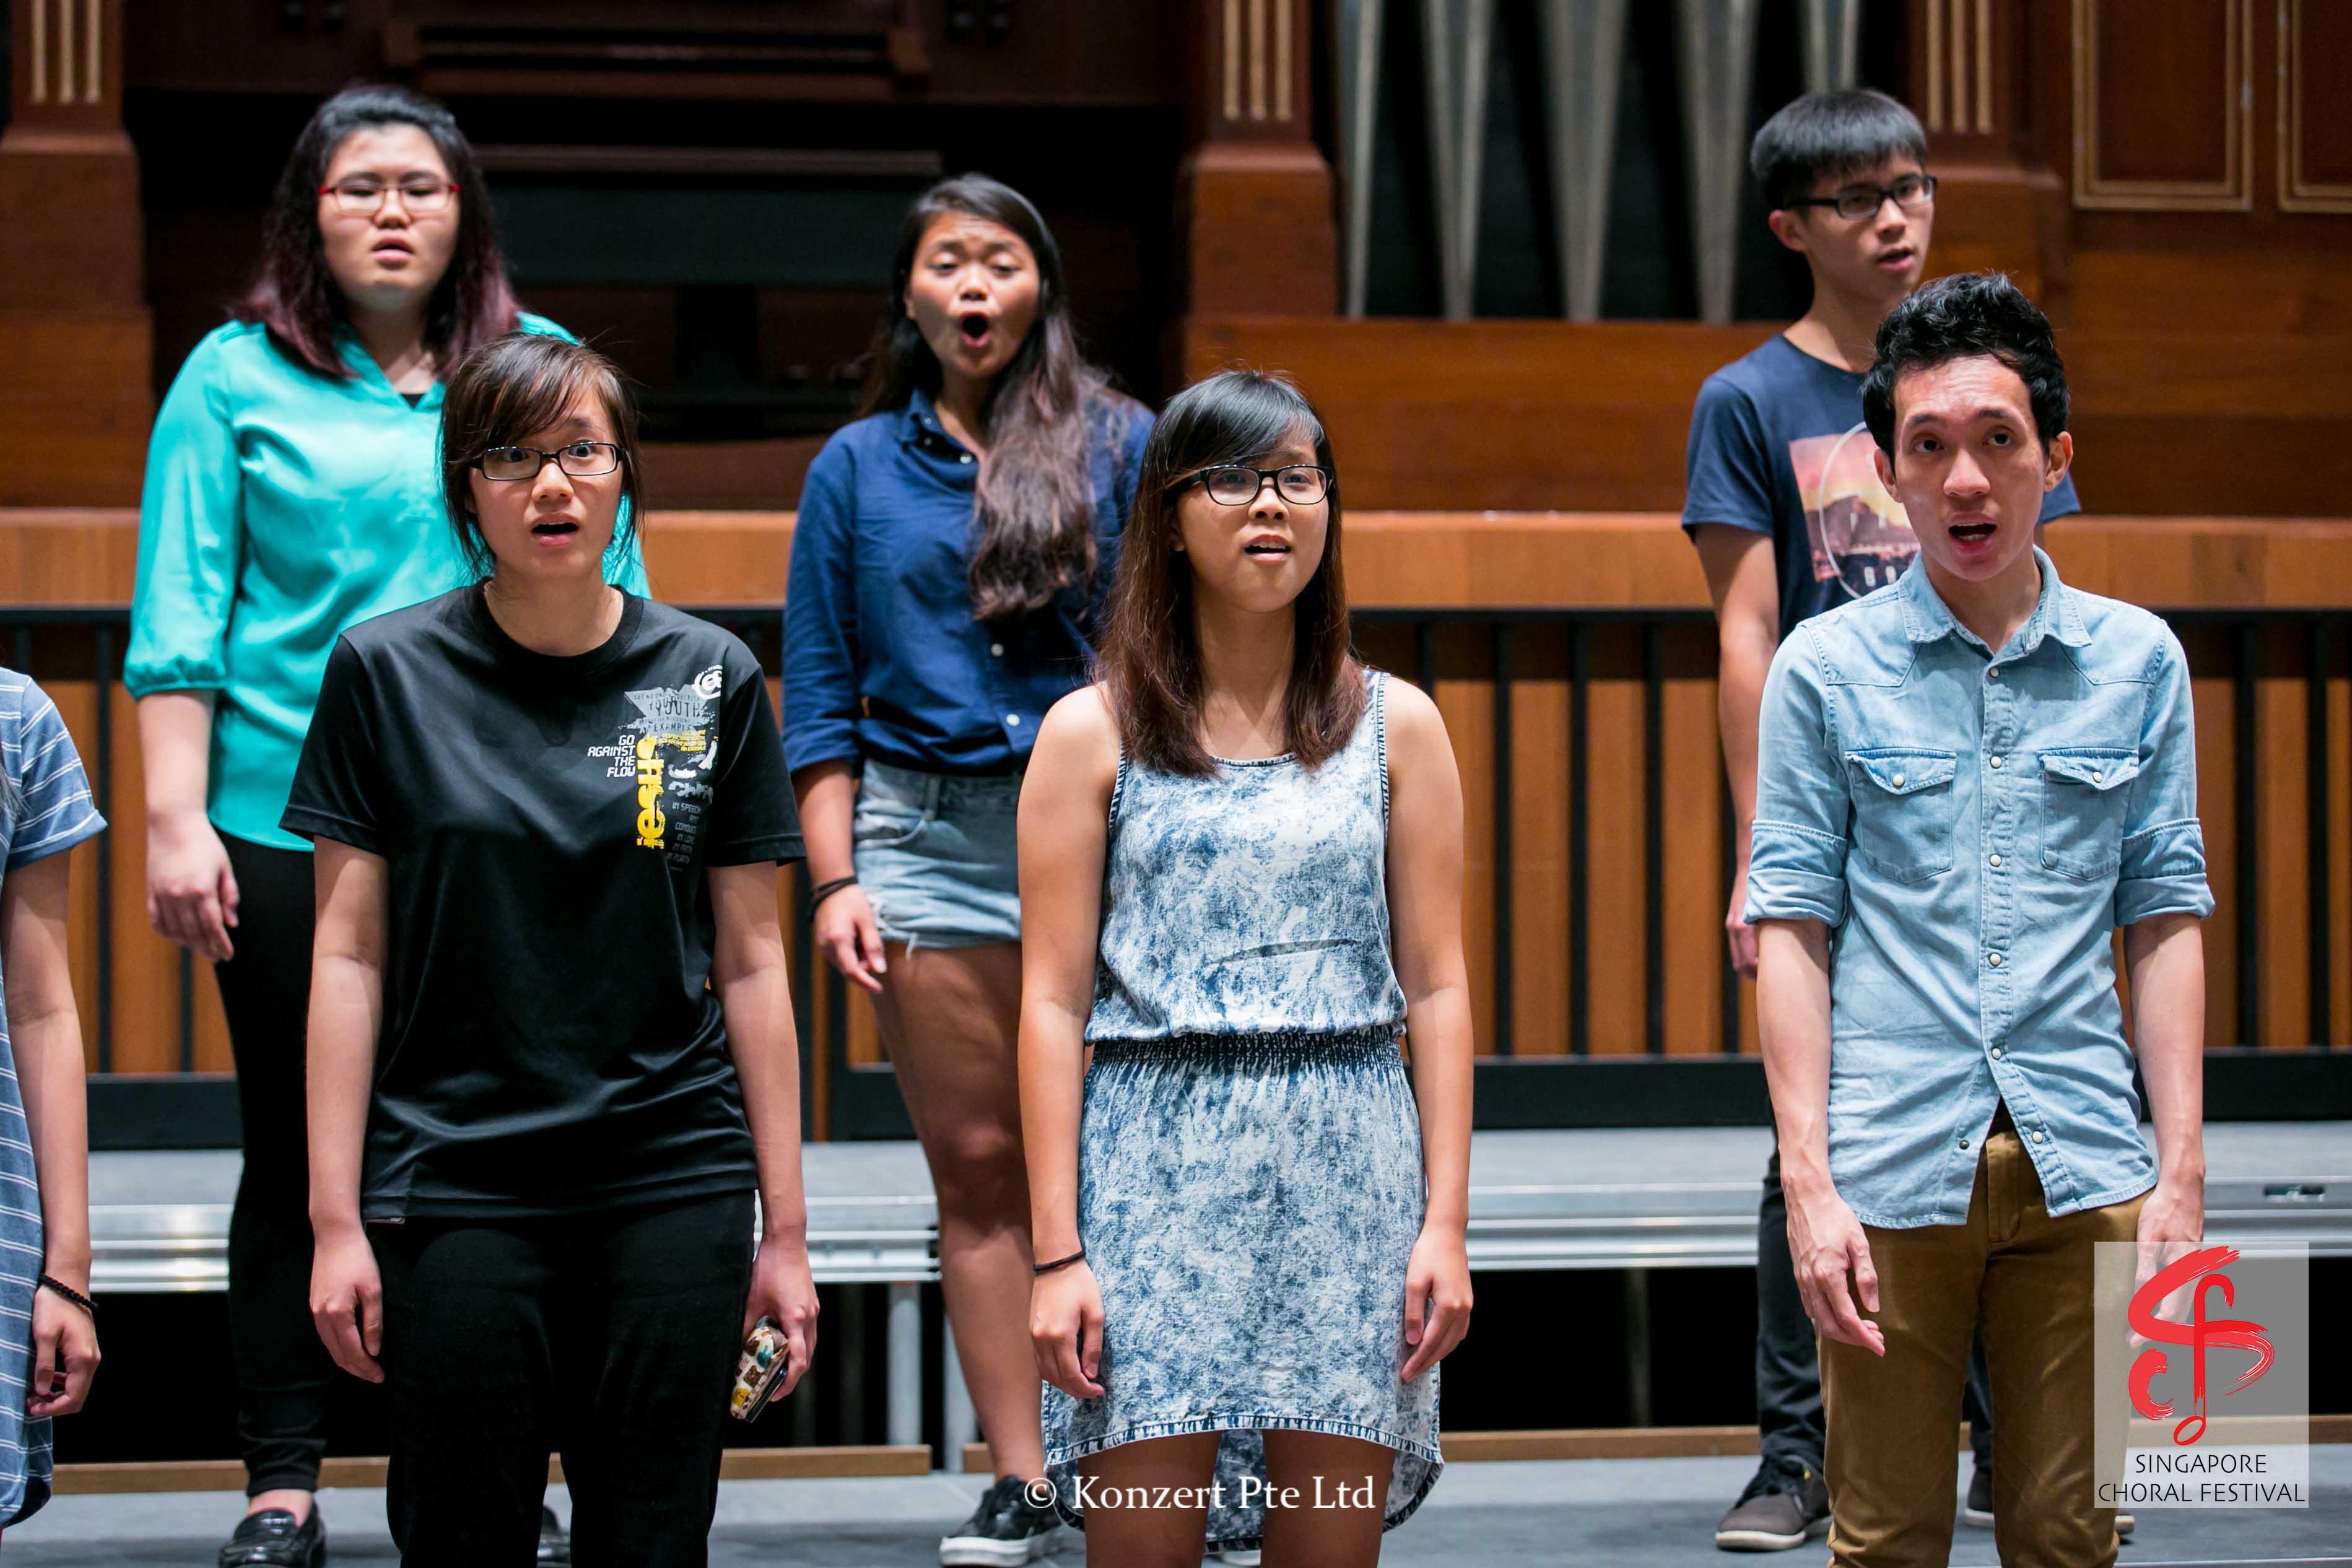 Singapore Choral Festival 7-8-15 (111).jpg